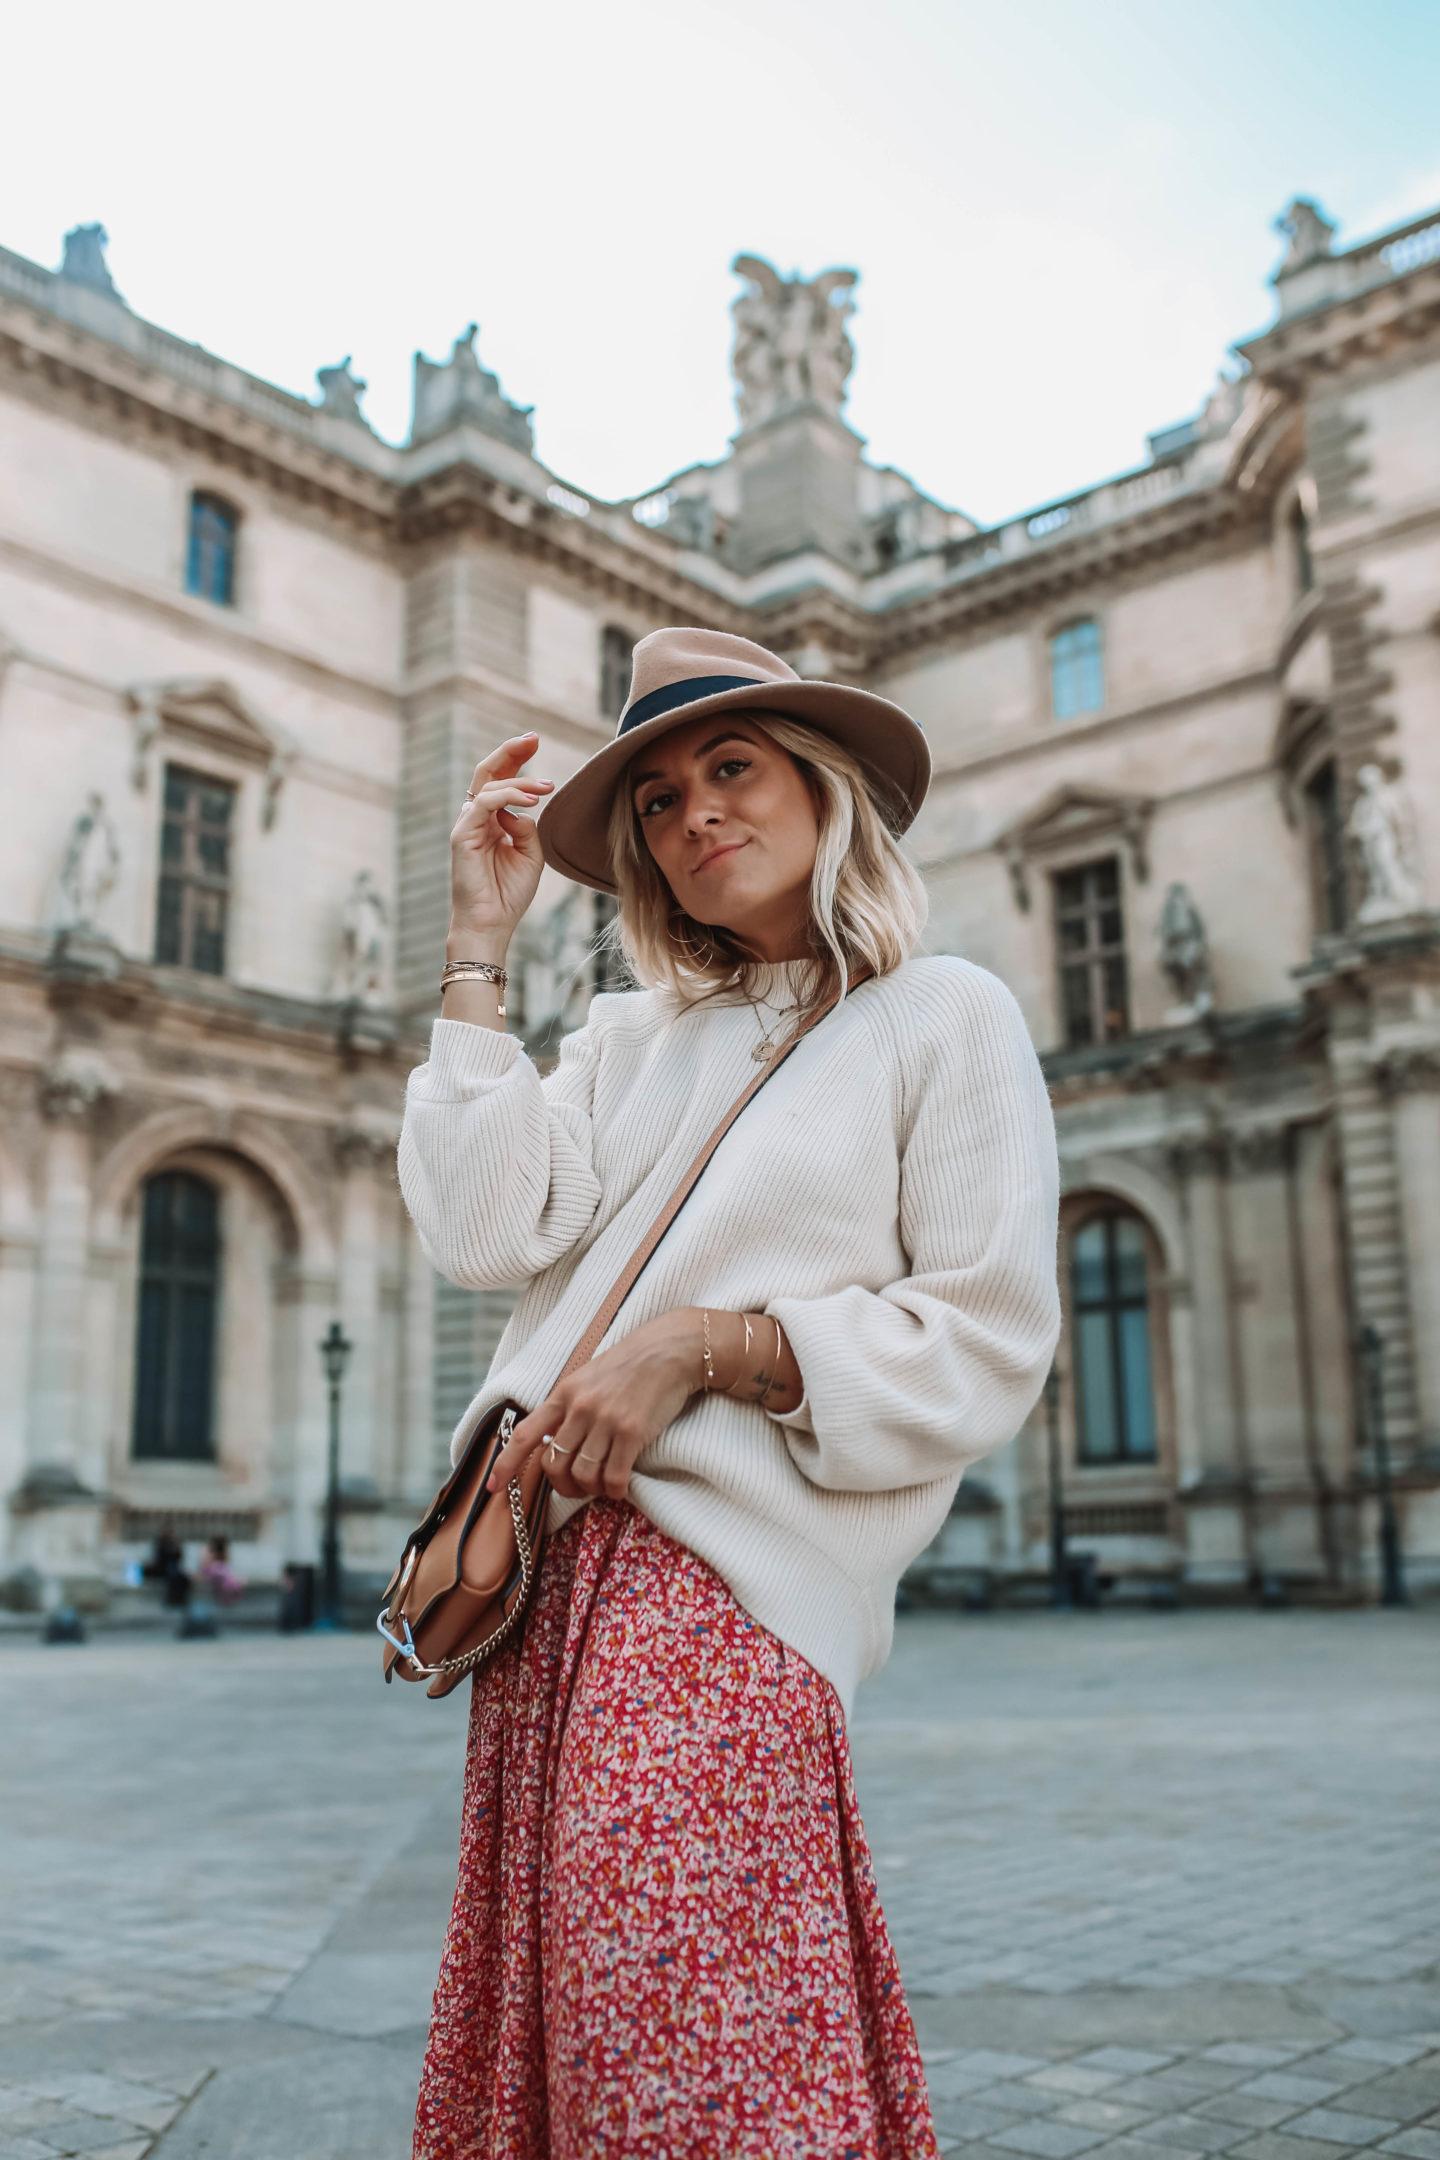 Pull oversize Mango - Blondie Baby blog mode Paris et voyages